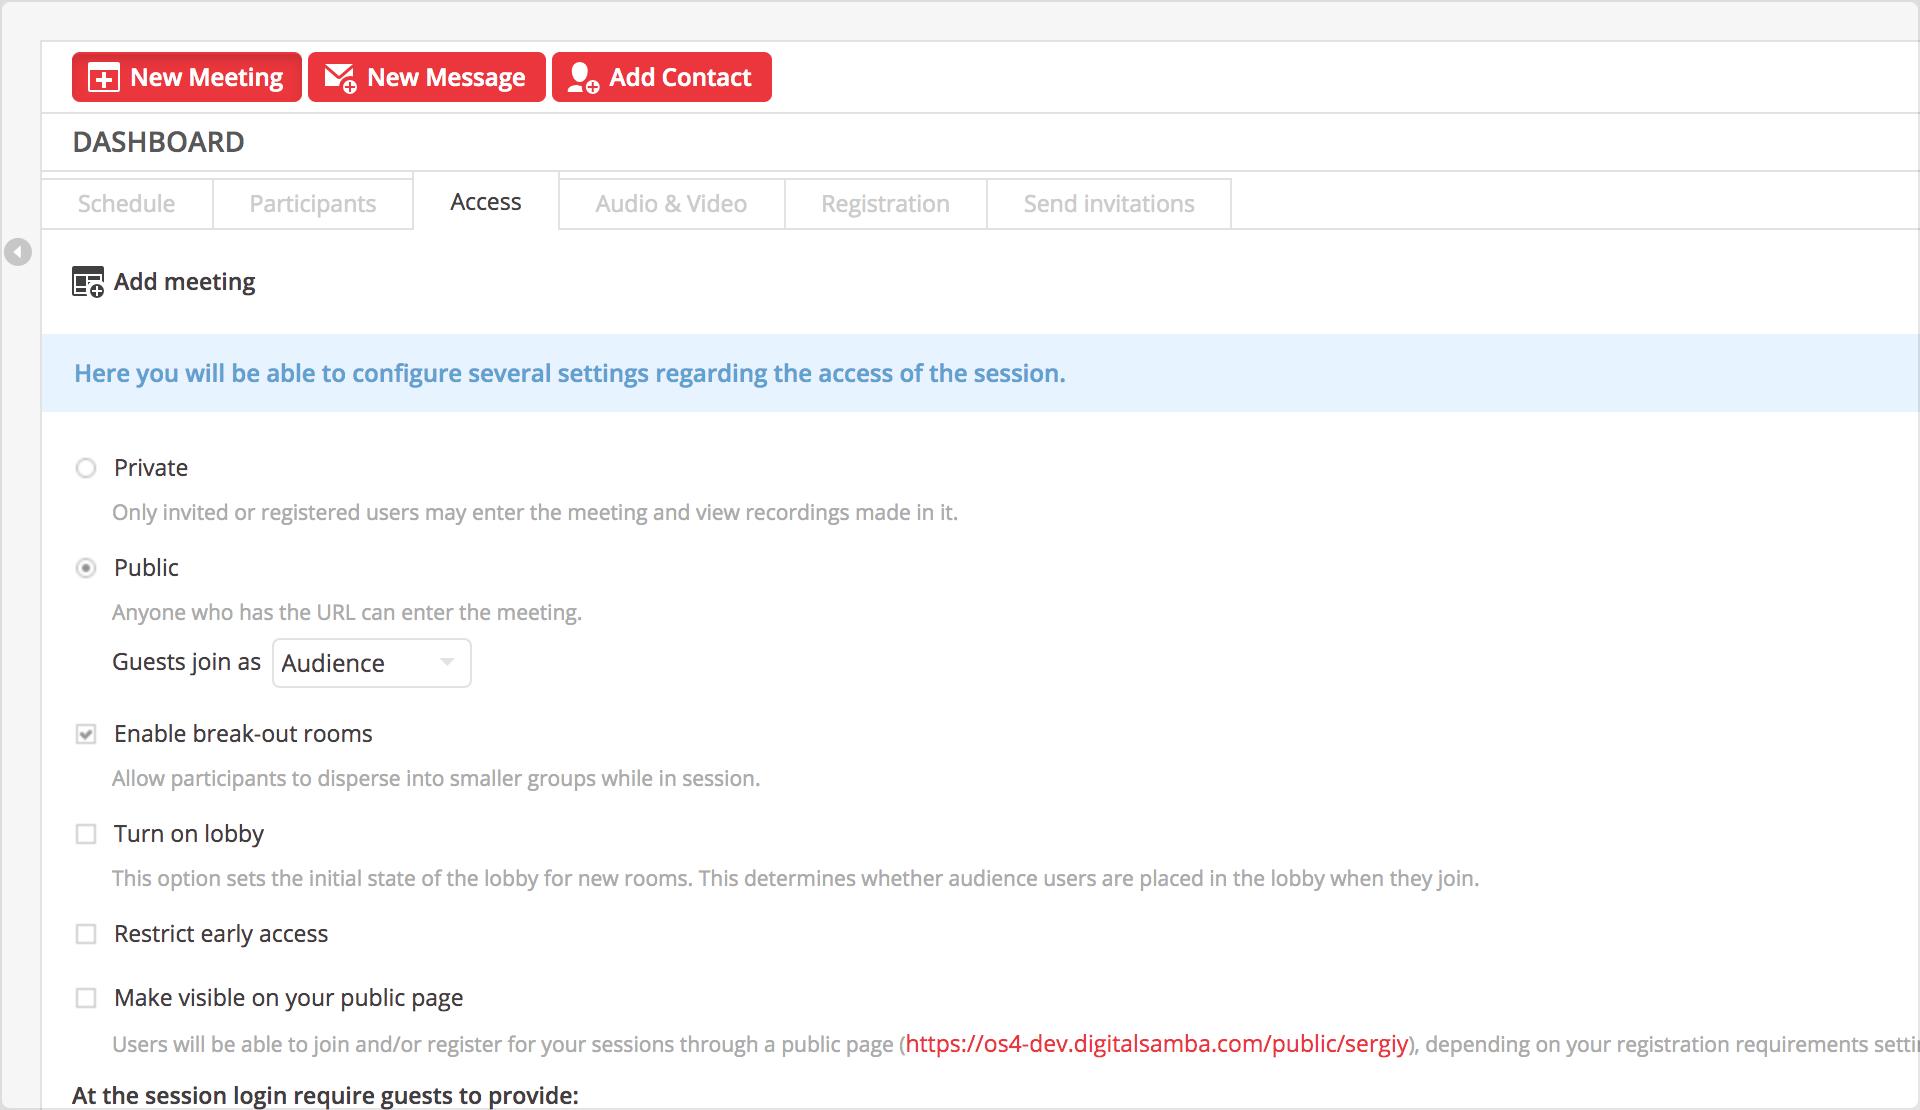 1. Configure access settings